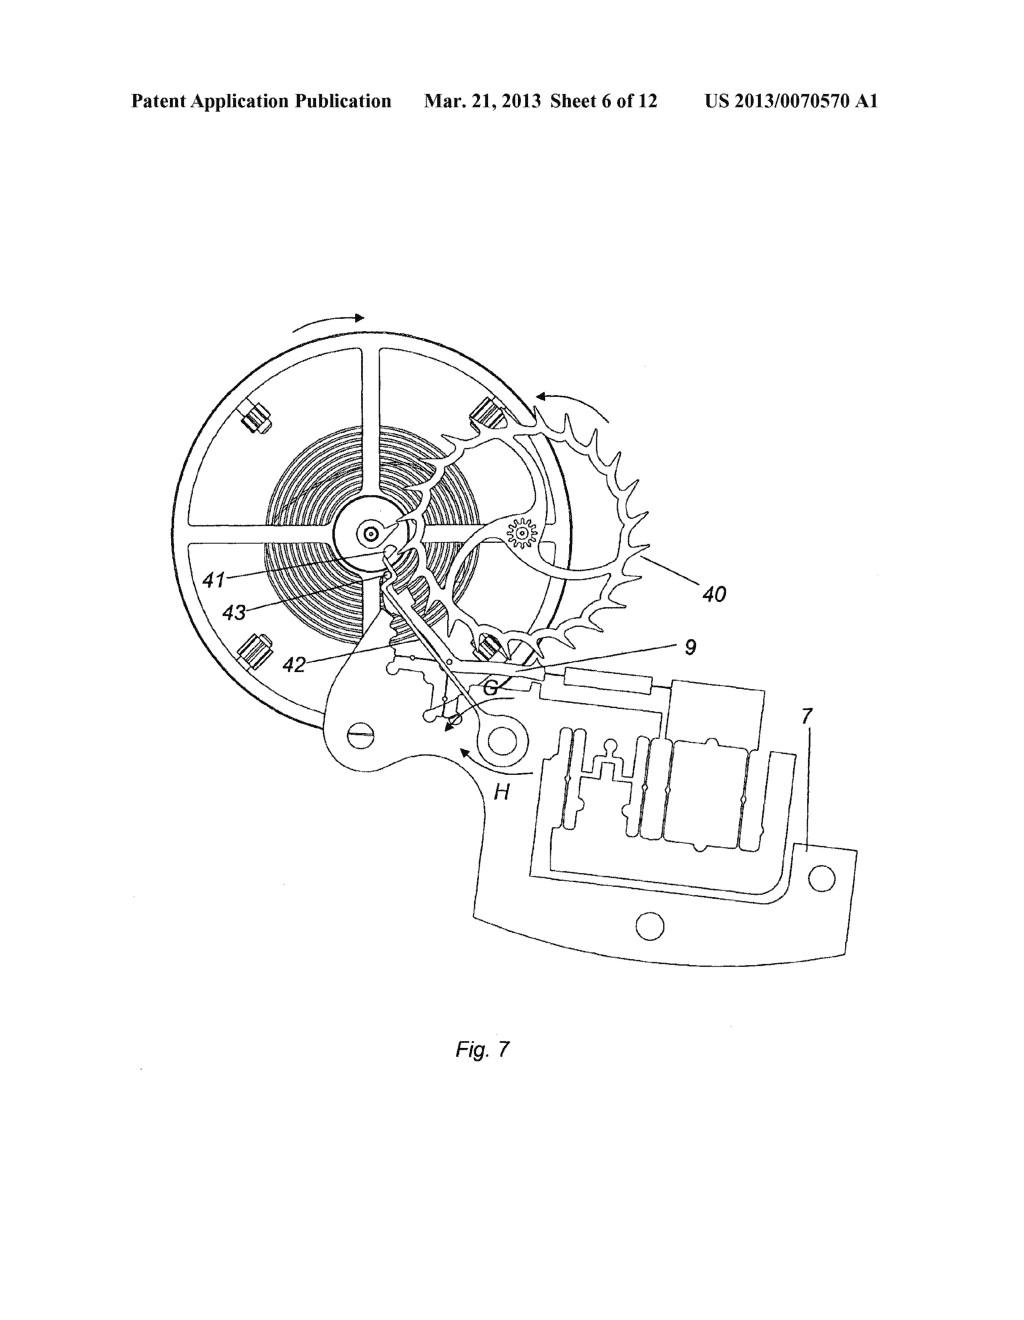 rolex-patent-8.jpg